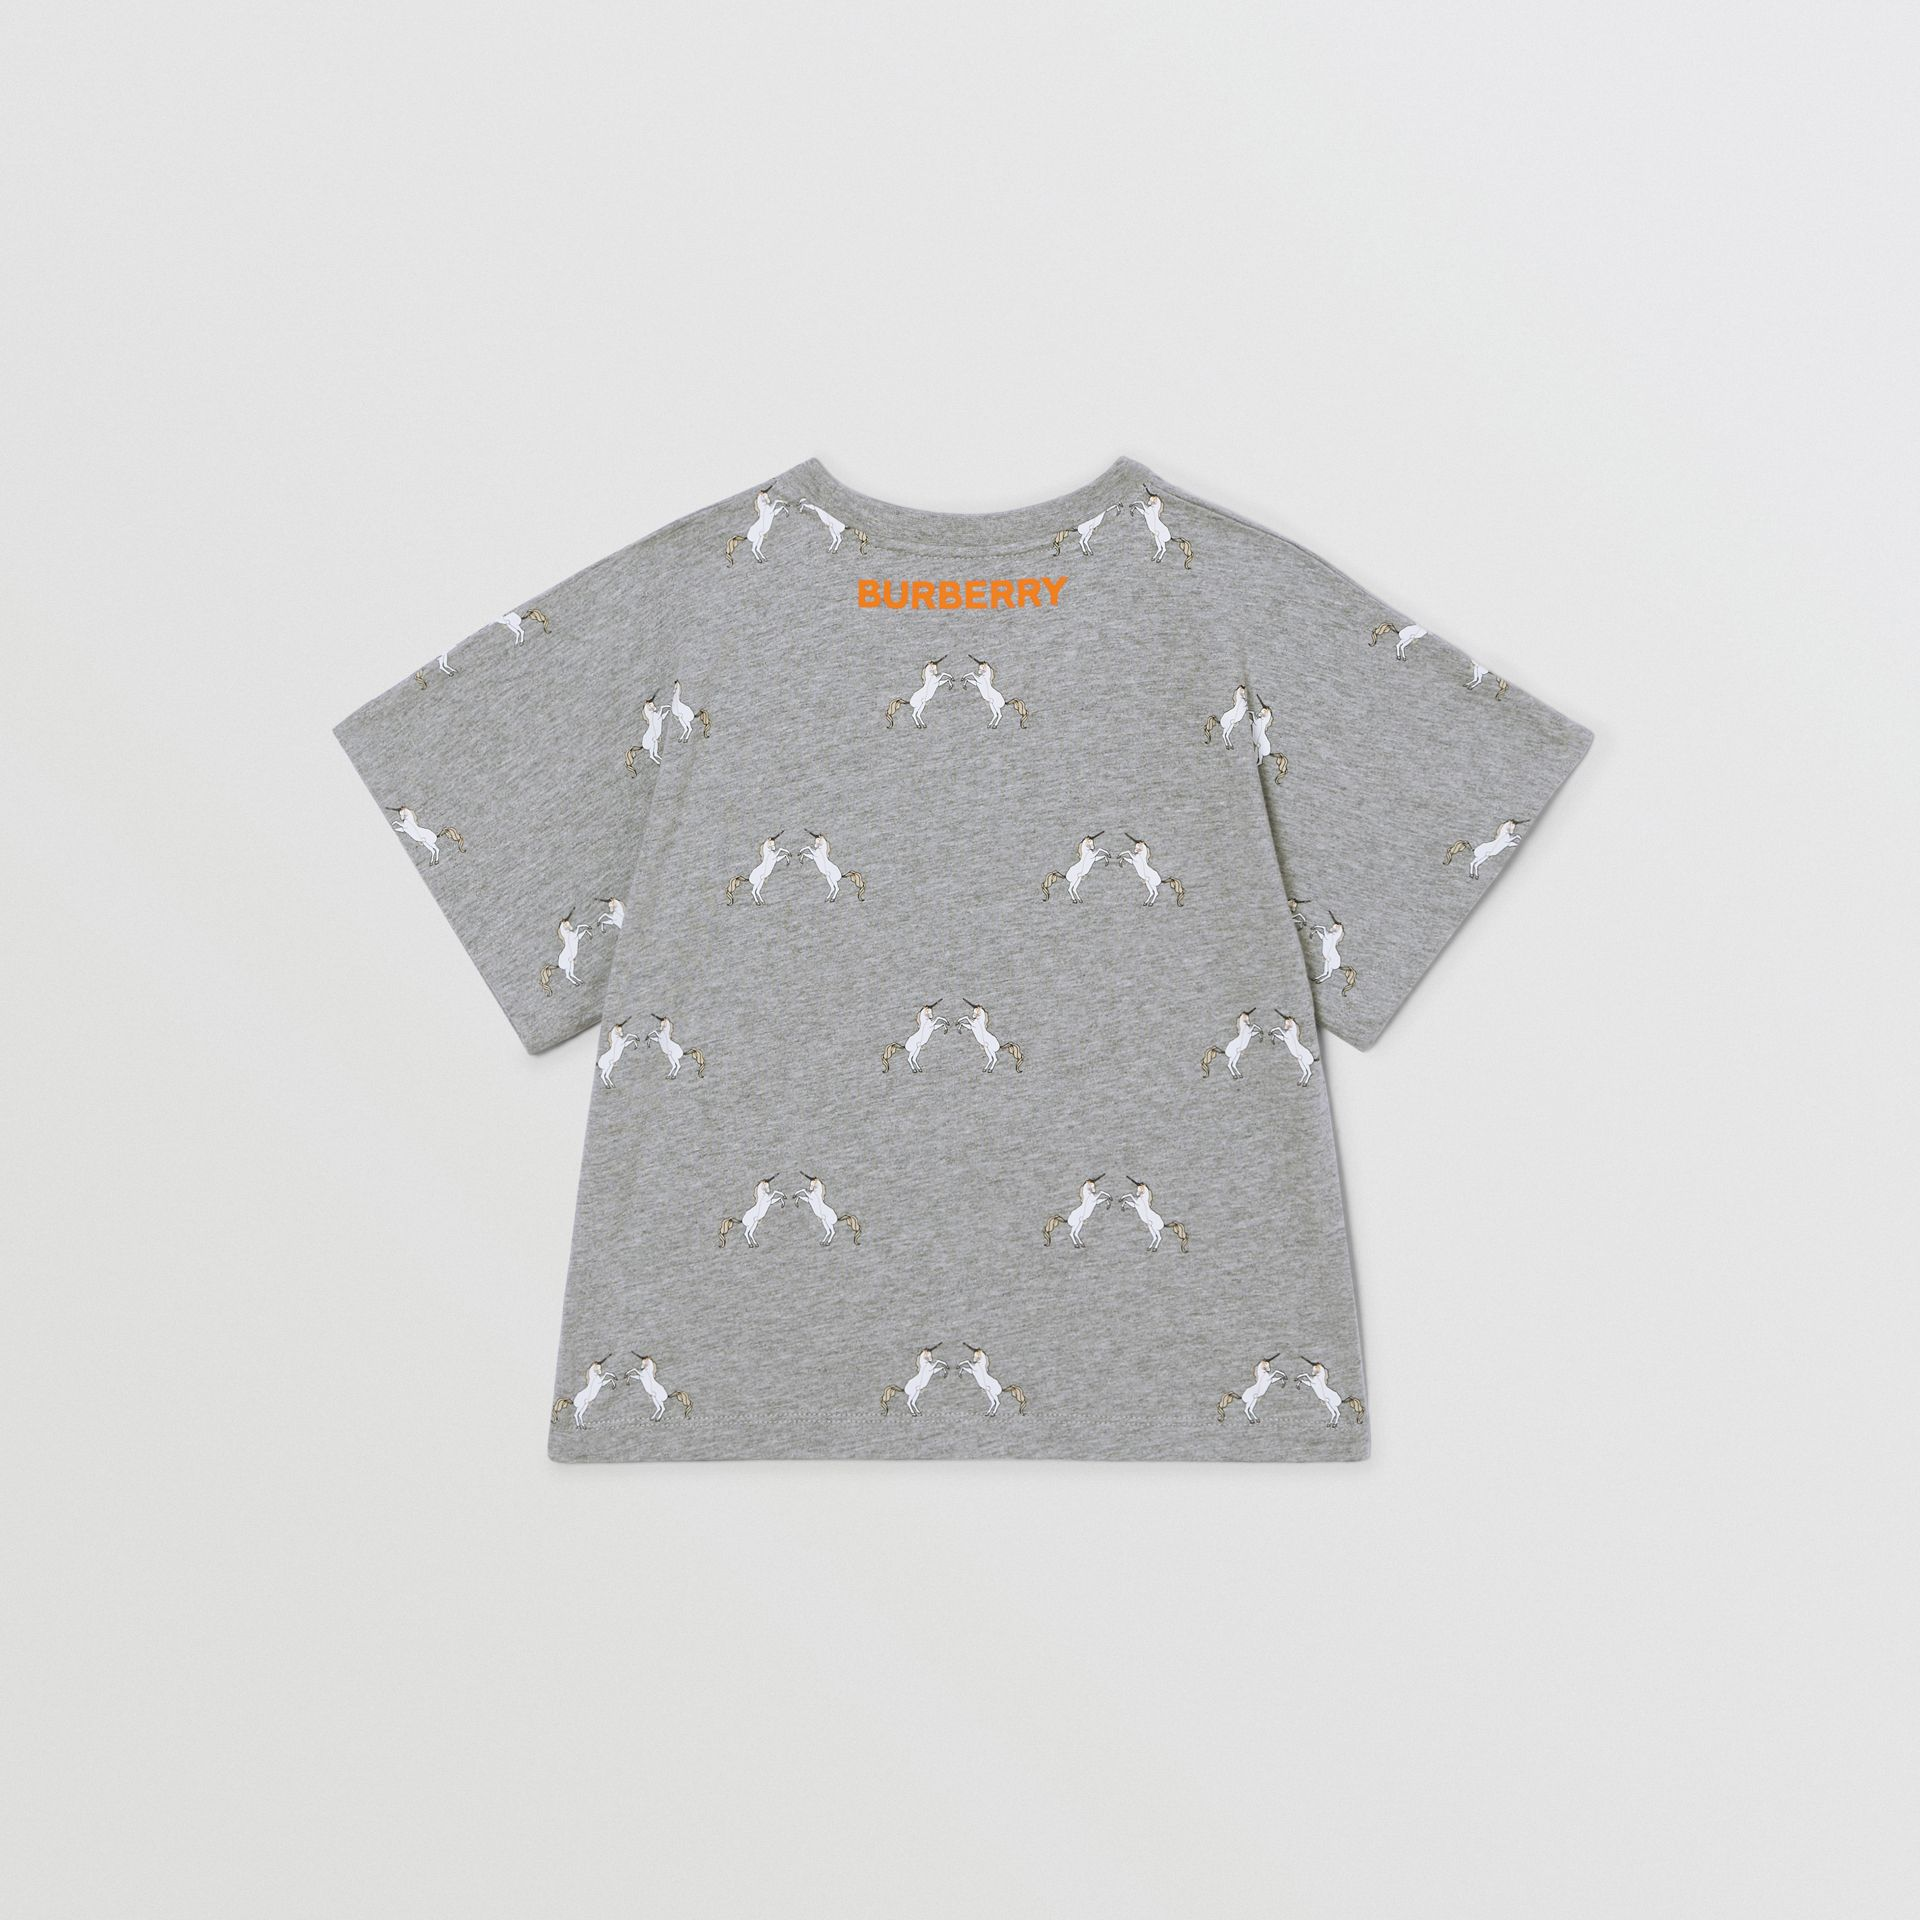 Unicorn Slogan Print Cotton T-shirt in Grey Melange | Burberry United Kingdom - gallery image 3